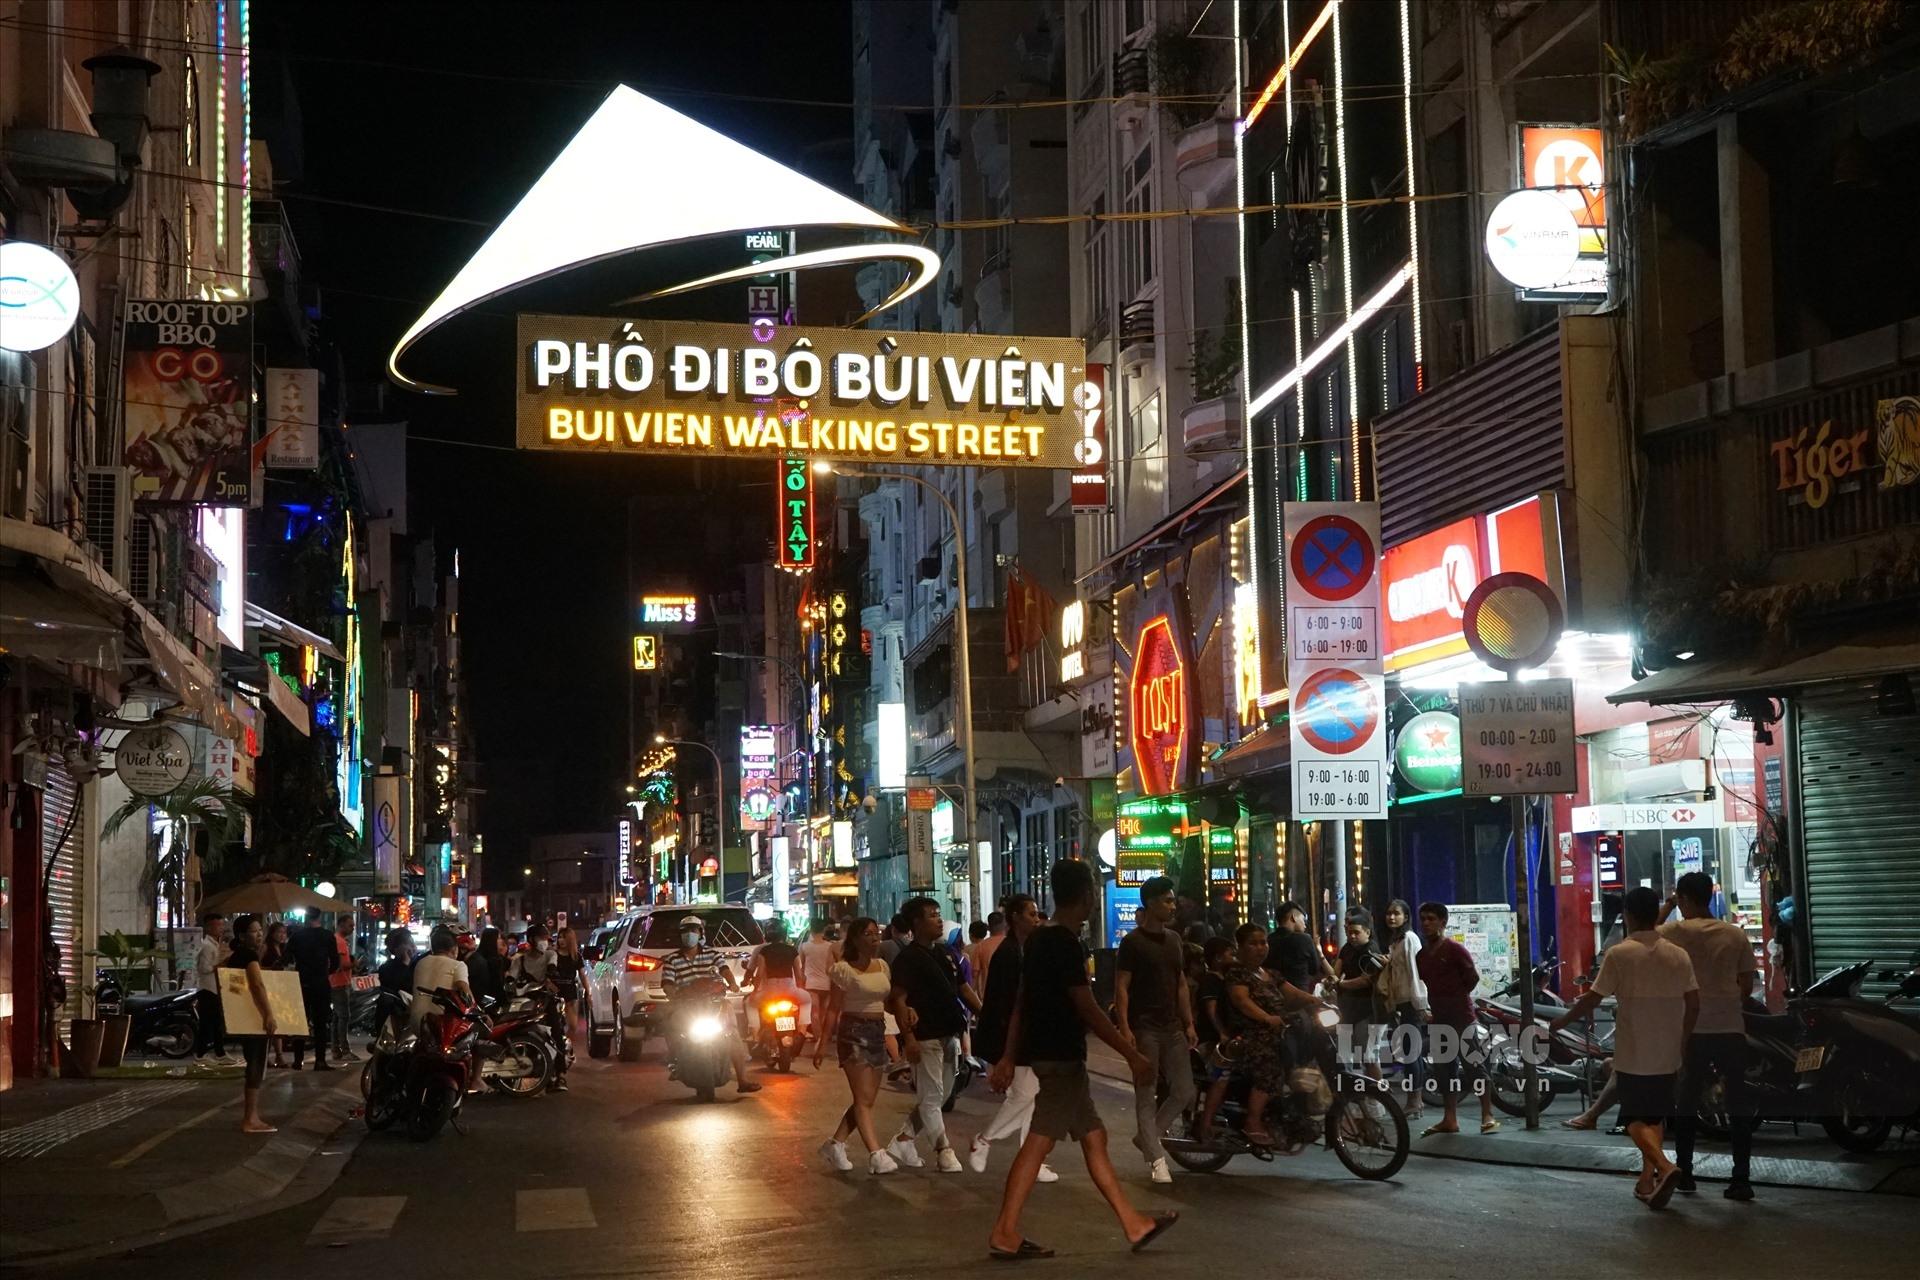 bui vien sai gons backpacker street bustling again